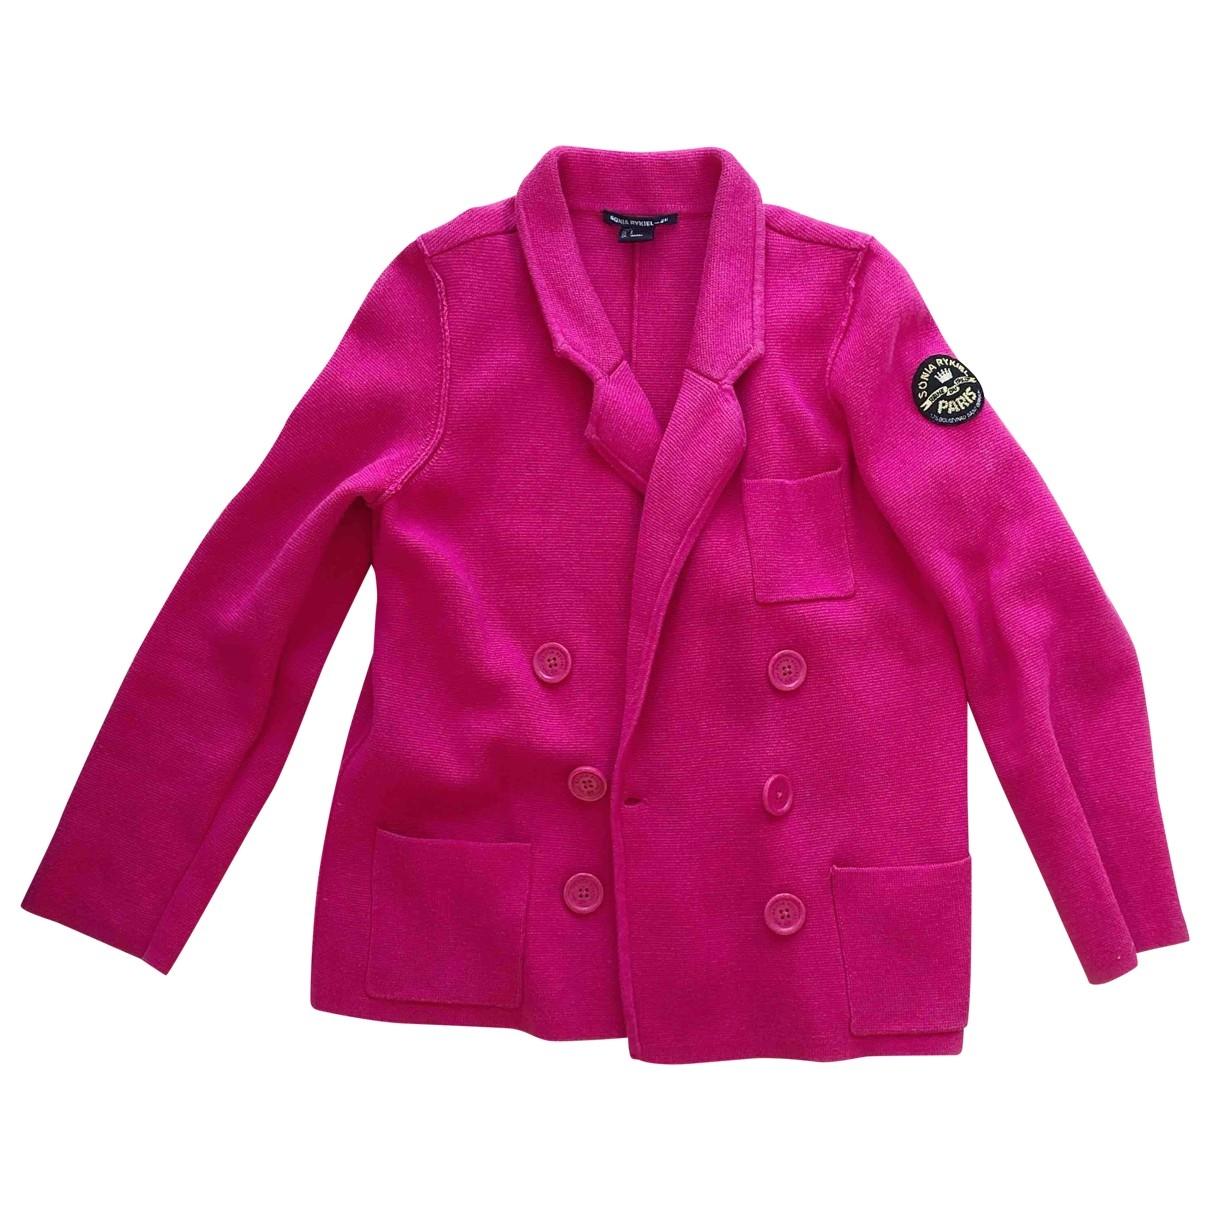 Sonia Rykiel Pour H&m \N Pink Cotton jacket for Women M International